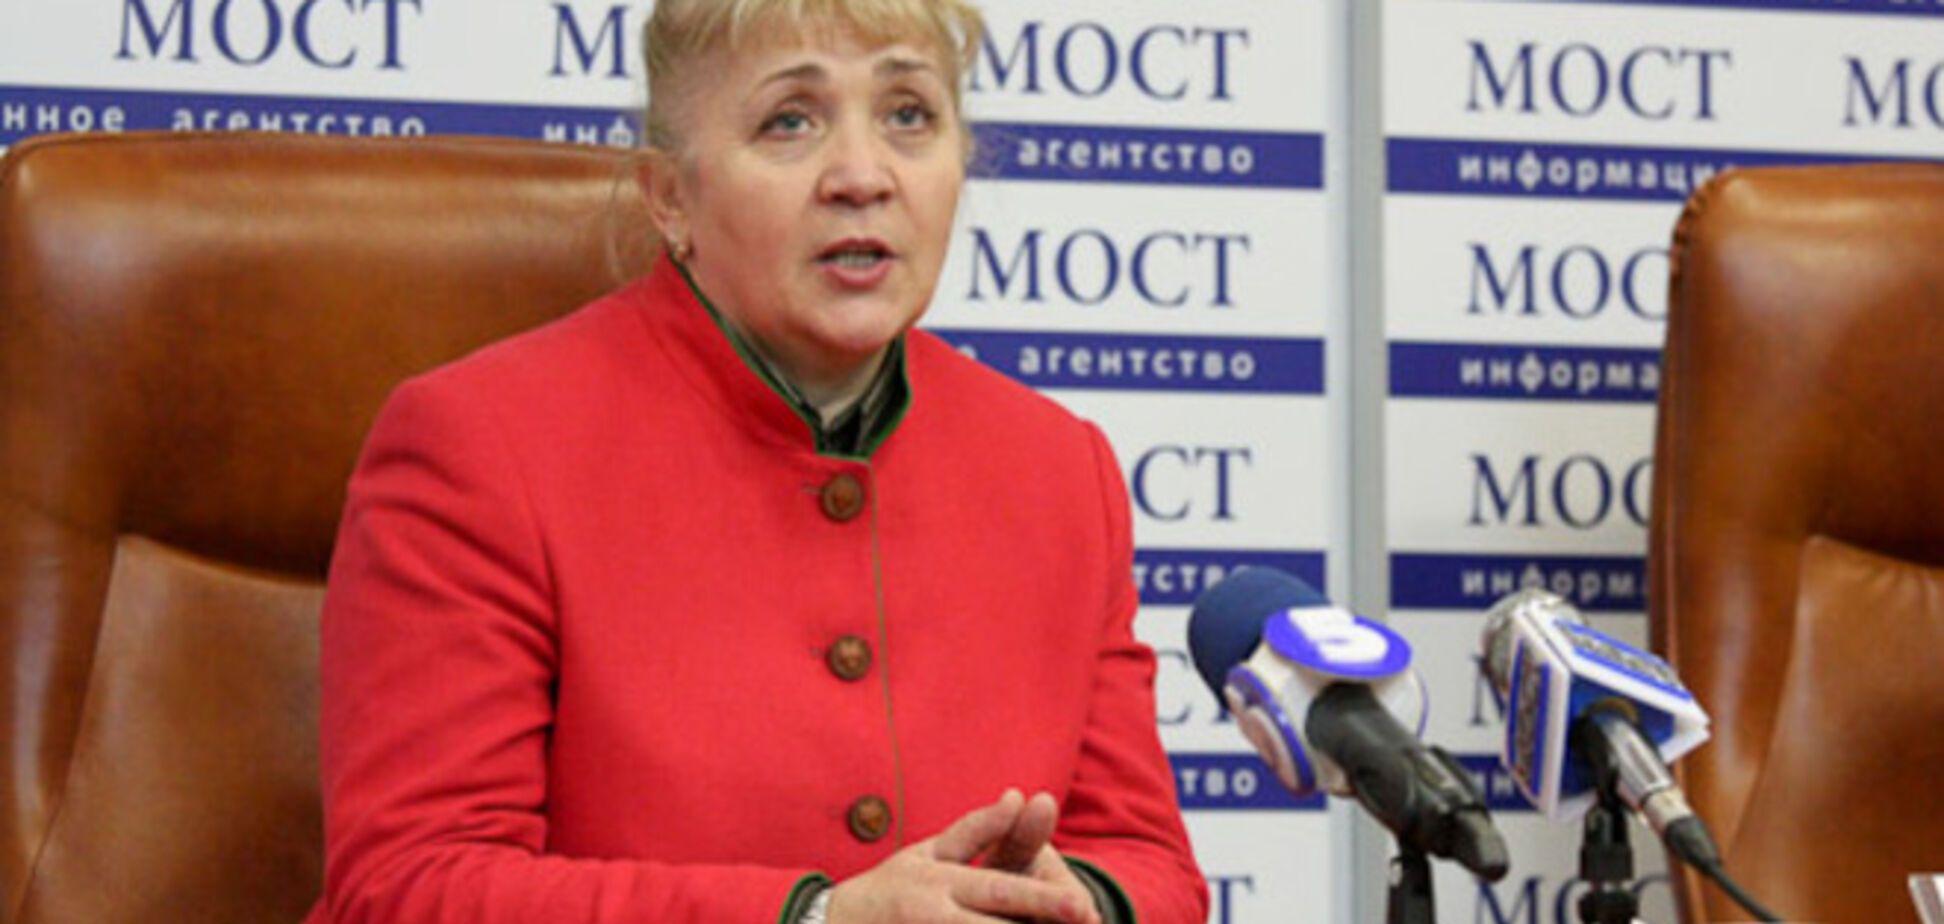 Экс-главу ФГИУ Валентину Семенюк избили двое мужчин. Она госпитализирована